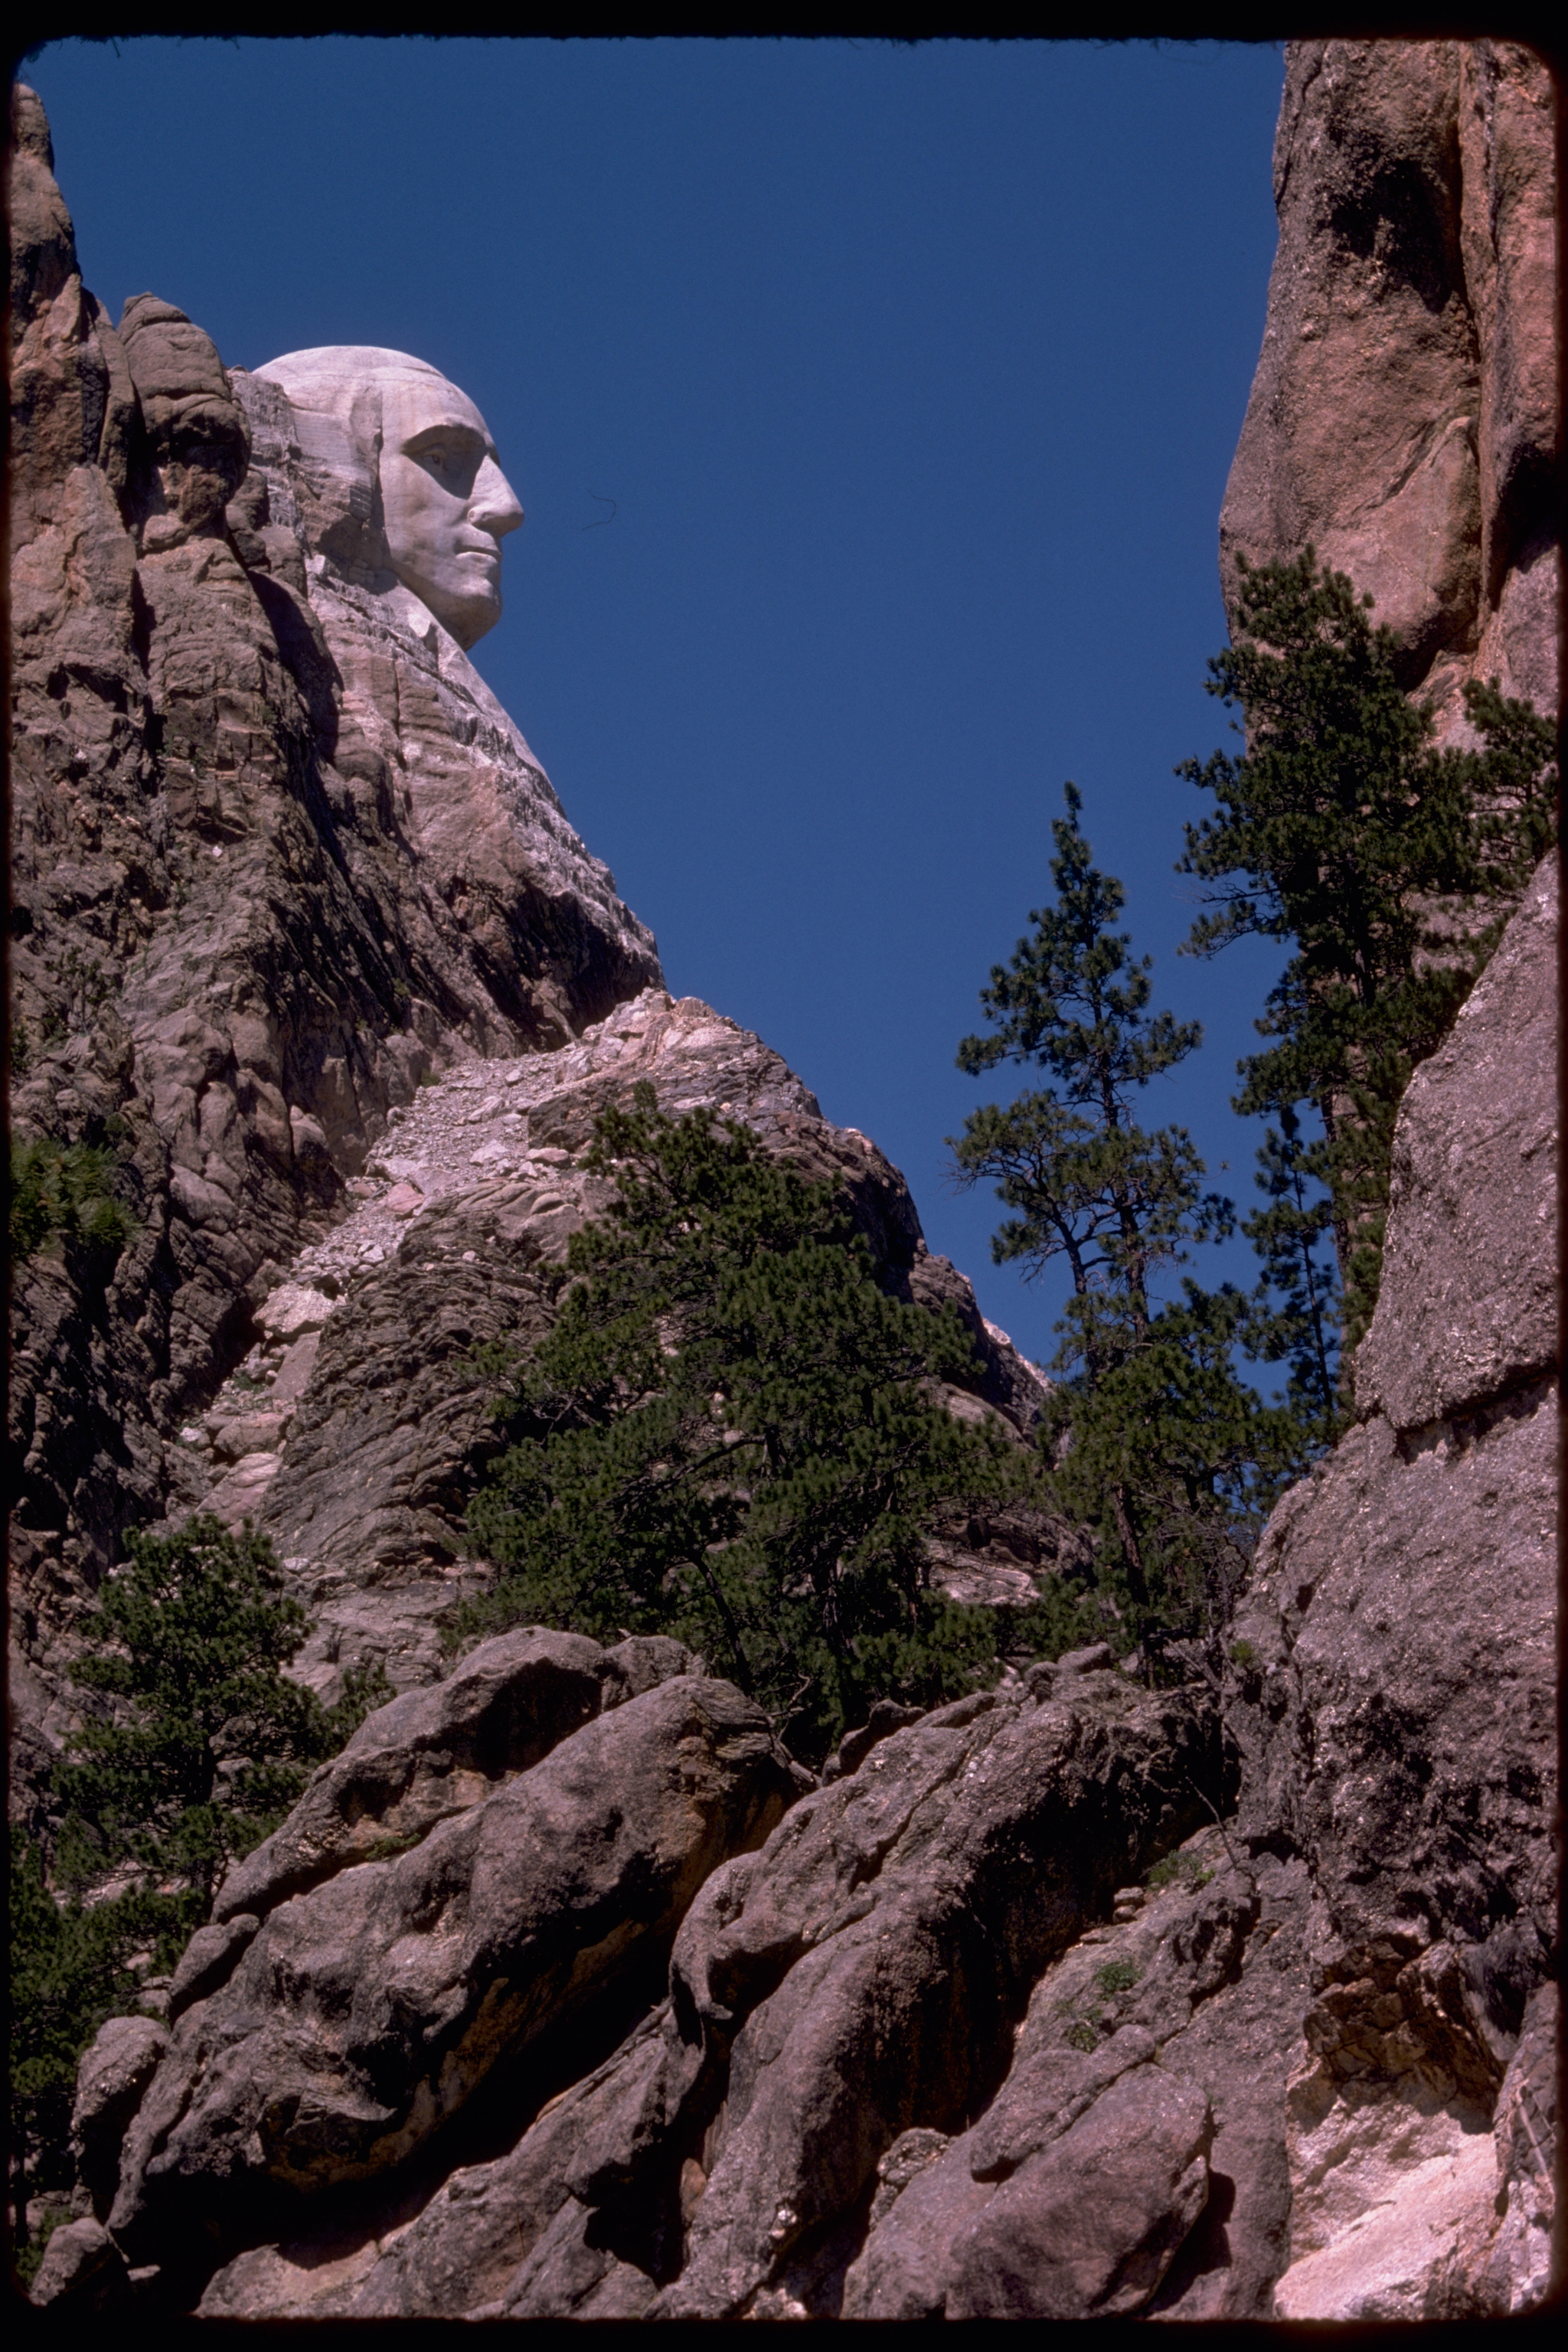 http://upload.wikimedia.org/wikipedia/commons/c/cf/Mount_Rushmore_National_Memorial_MORU2010.jpg